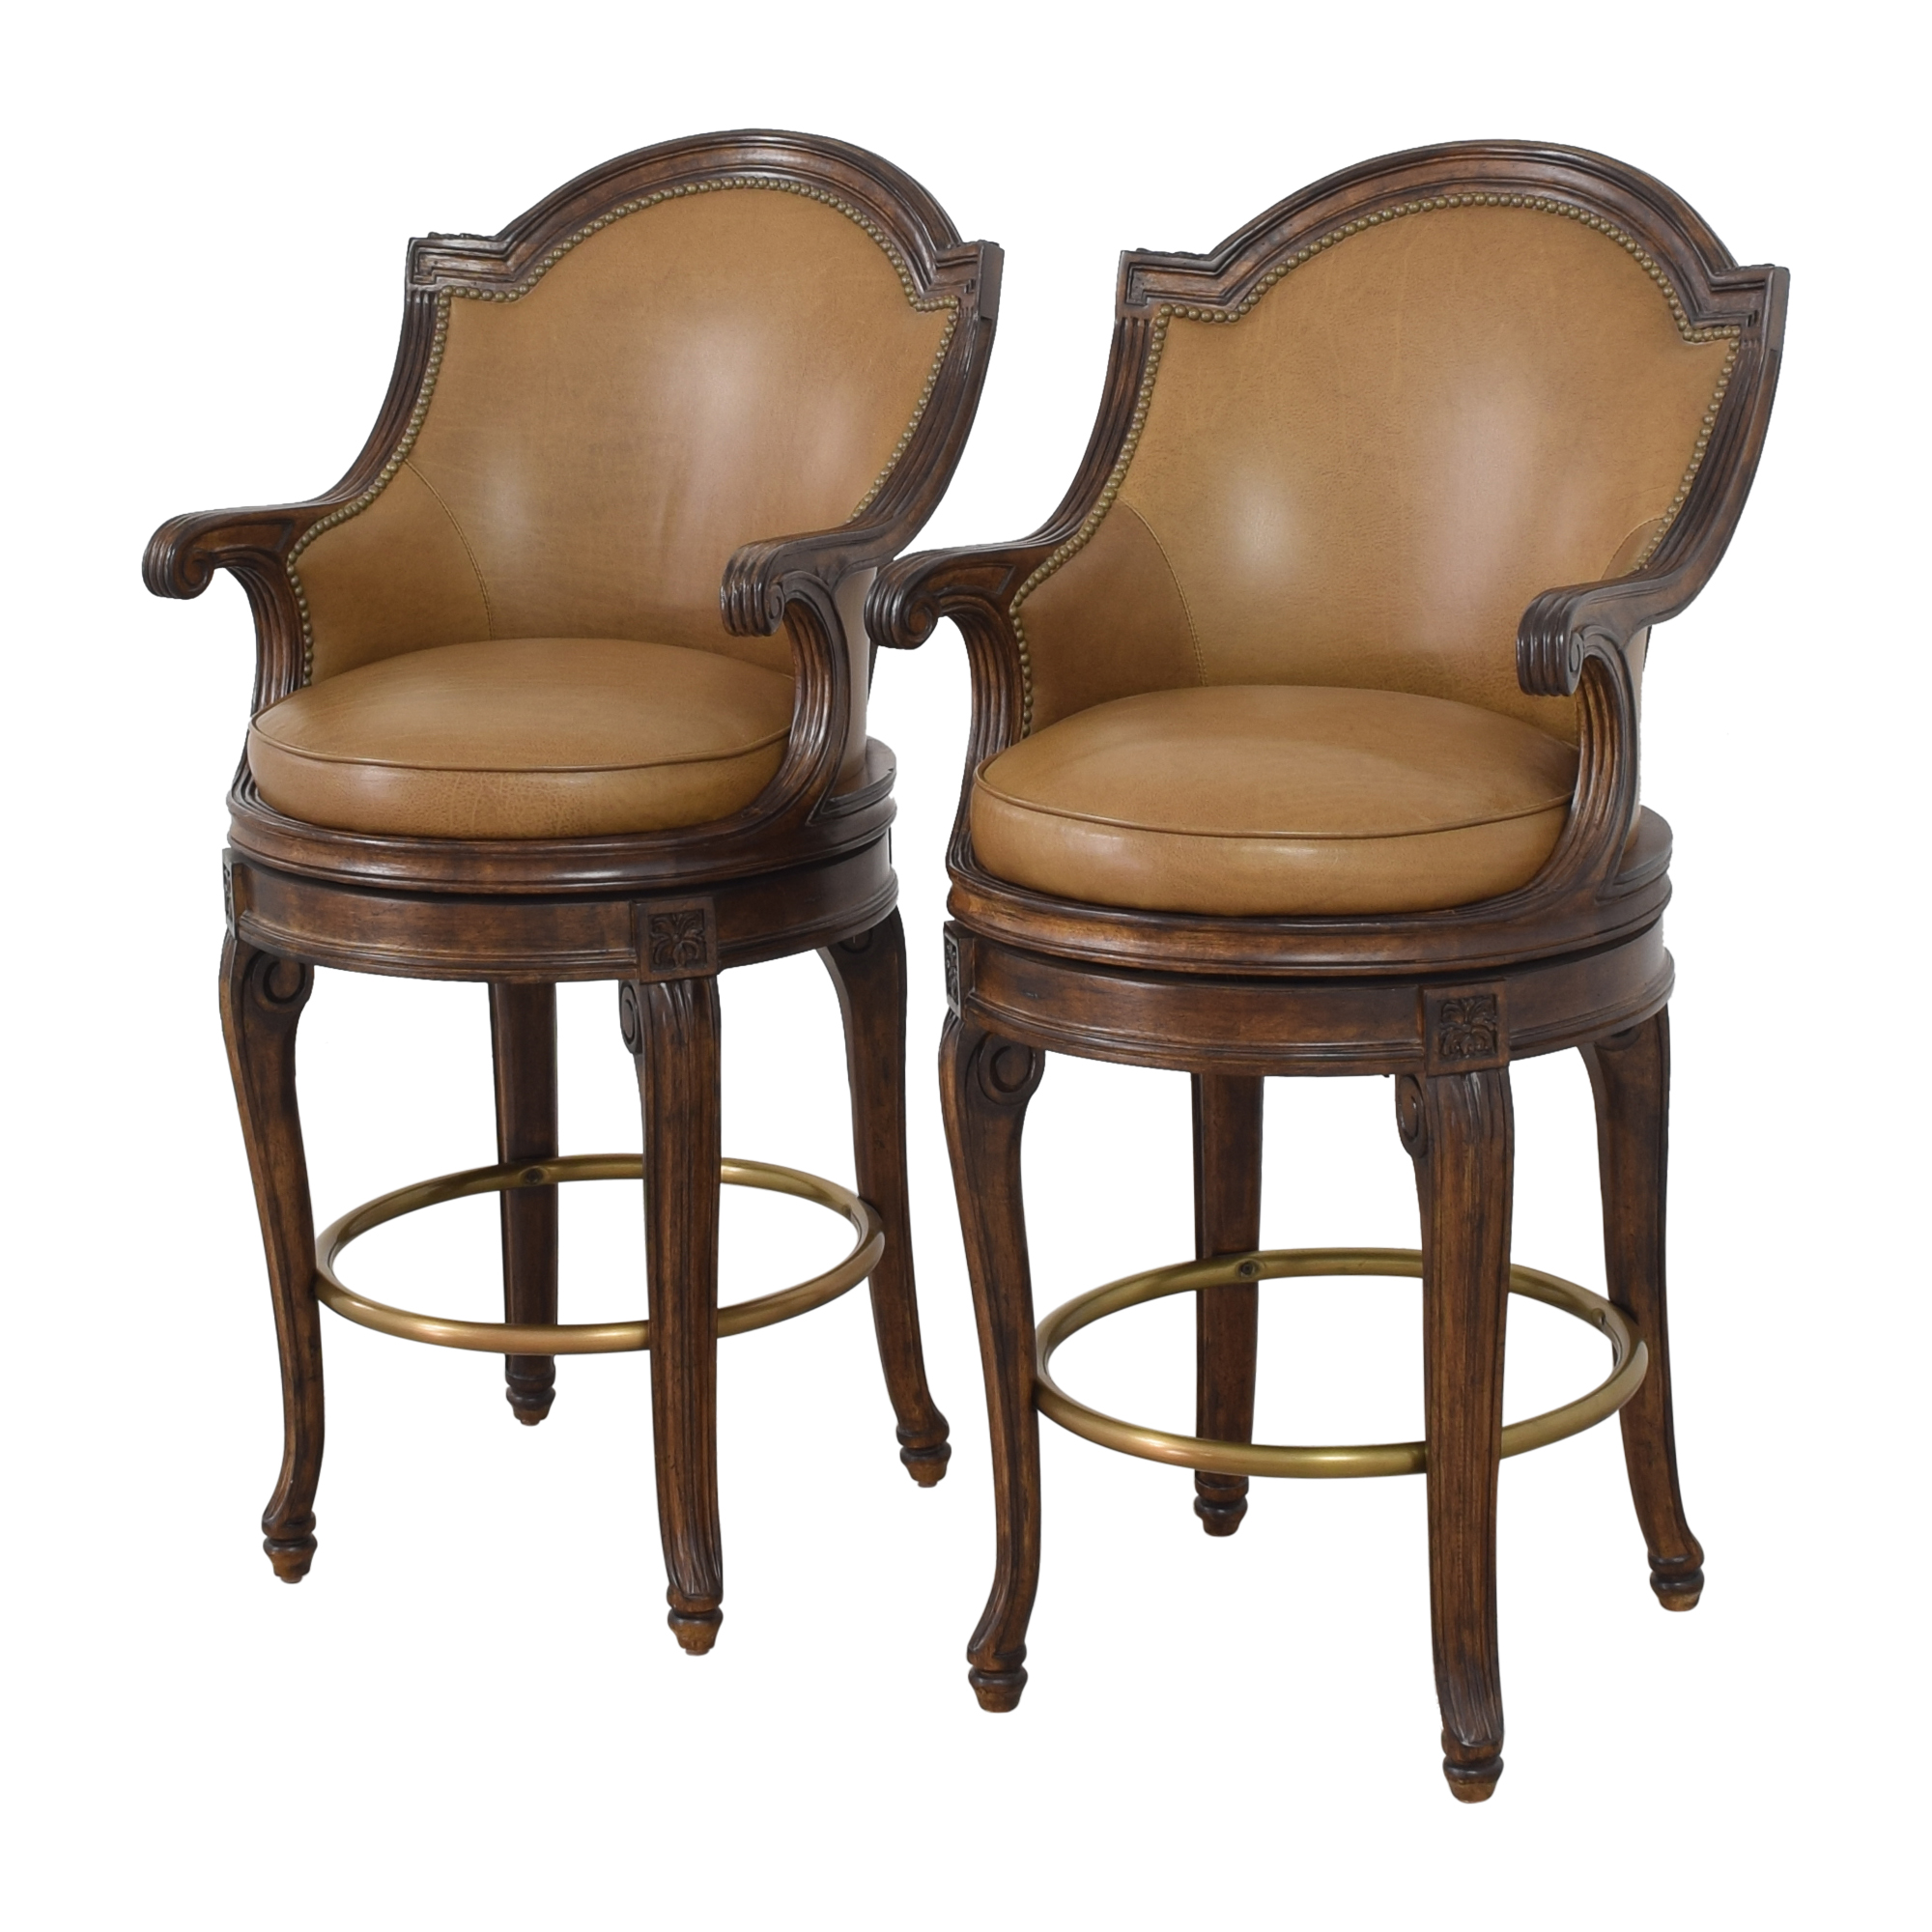 buy Century Furniture Century Furniture Savoy Bar Stools online